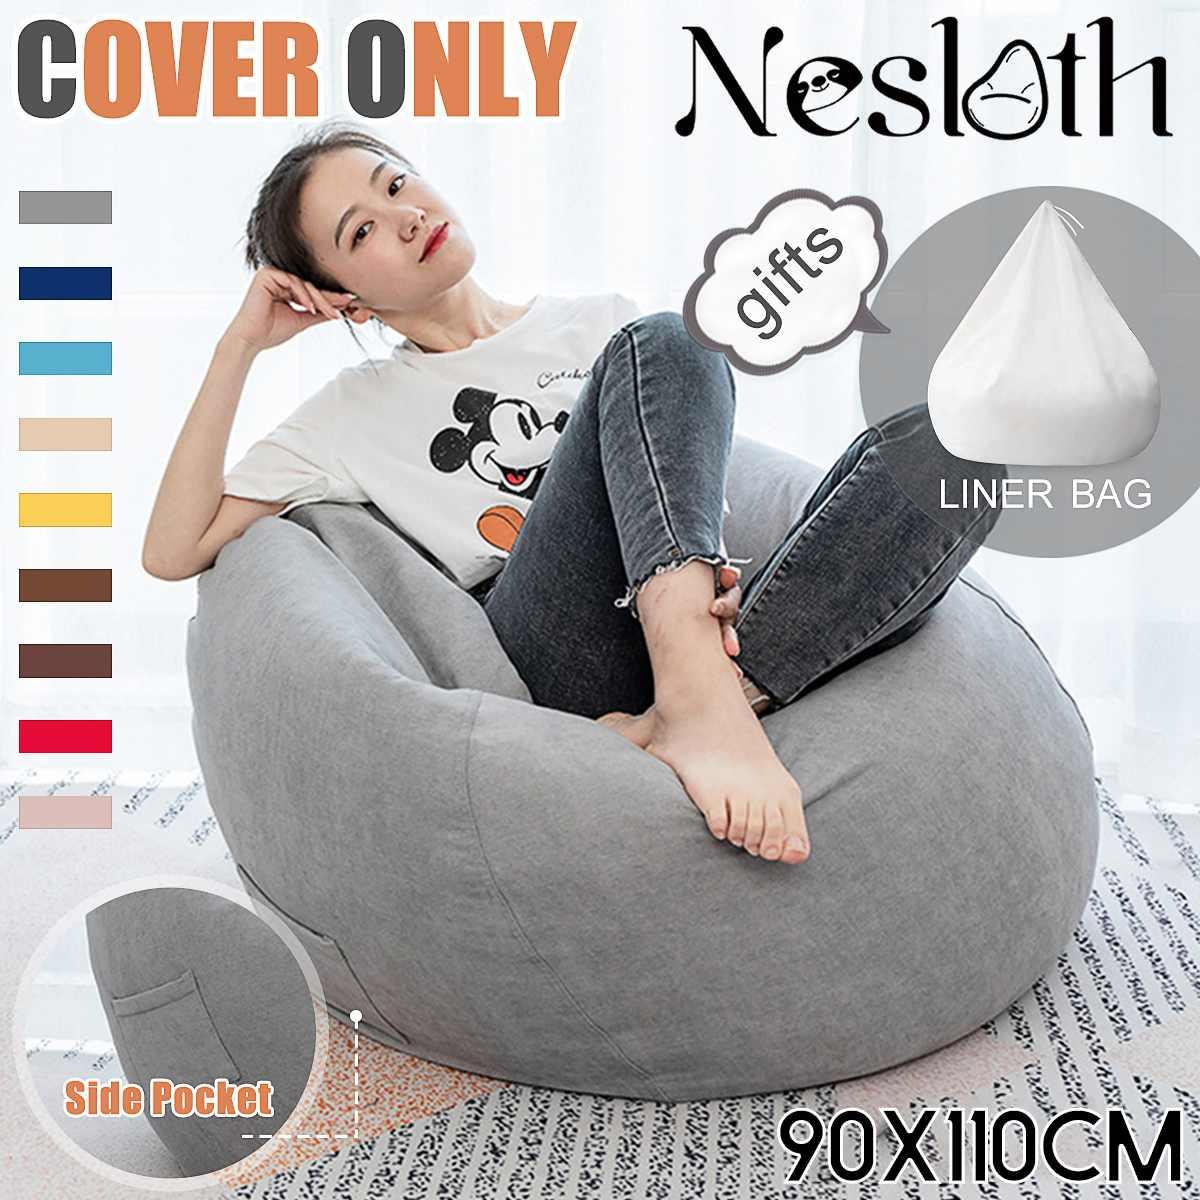 2Pcs/Set Lazy BeanBag Sofas Cover+Inner Liner NO Filler Velvet Fabric Lounger Seat Bean Bag Pouf Puff Couch Tatami Living Room